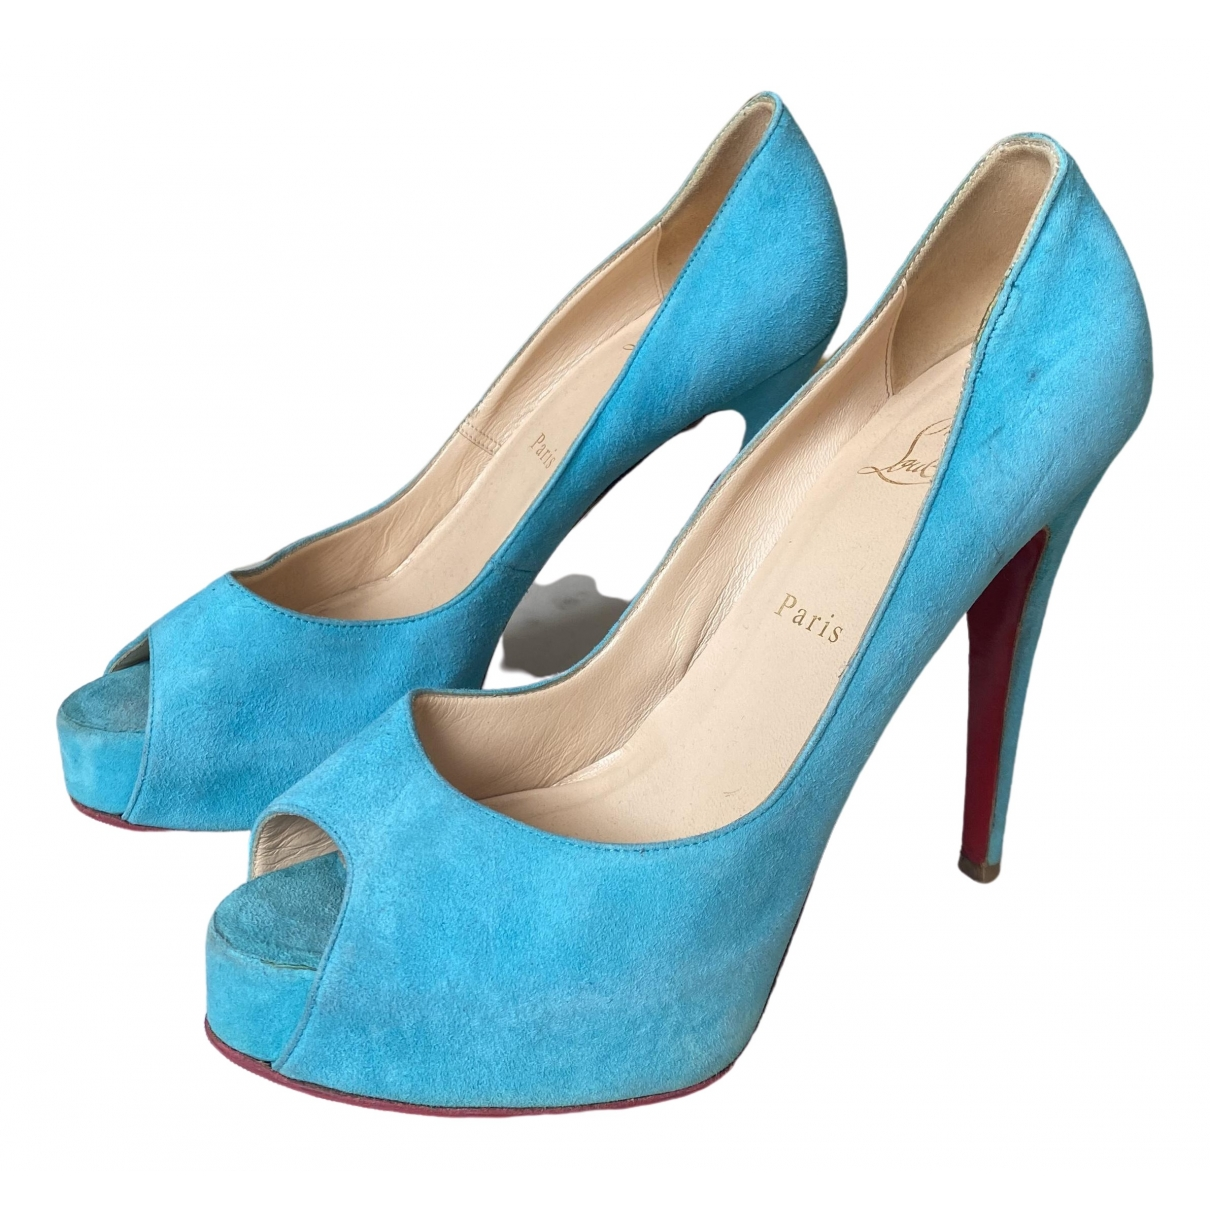 Christian Louboutin Lady Peep Turquoise Suede Heels for Women 39.5 EU